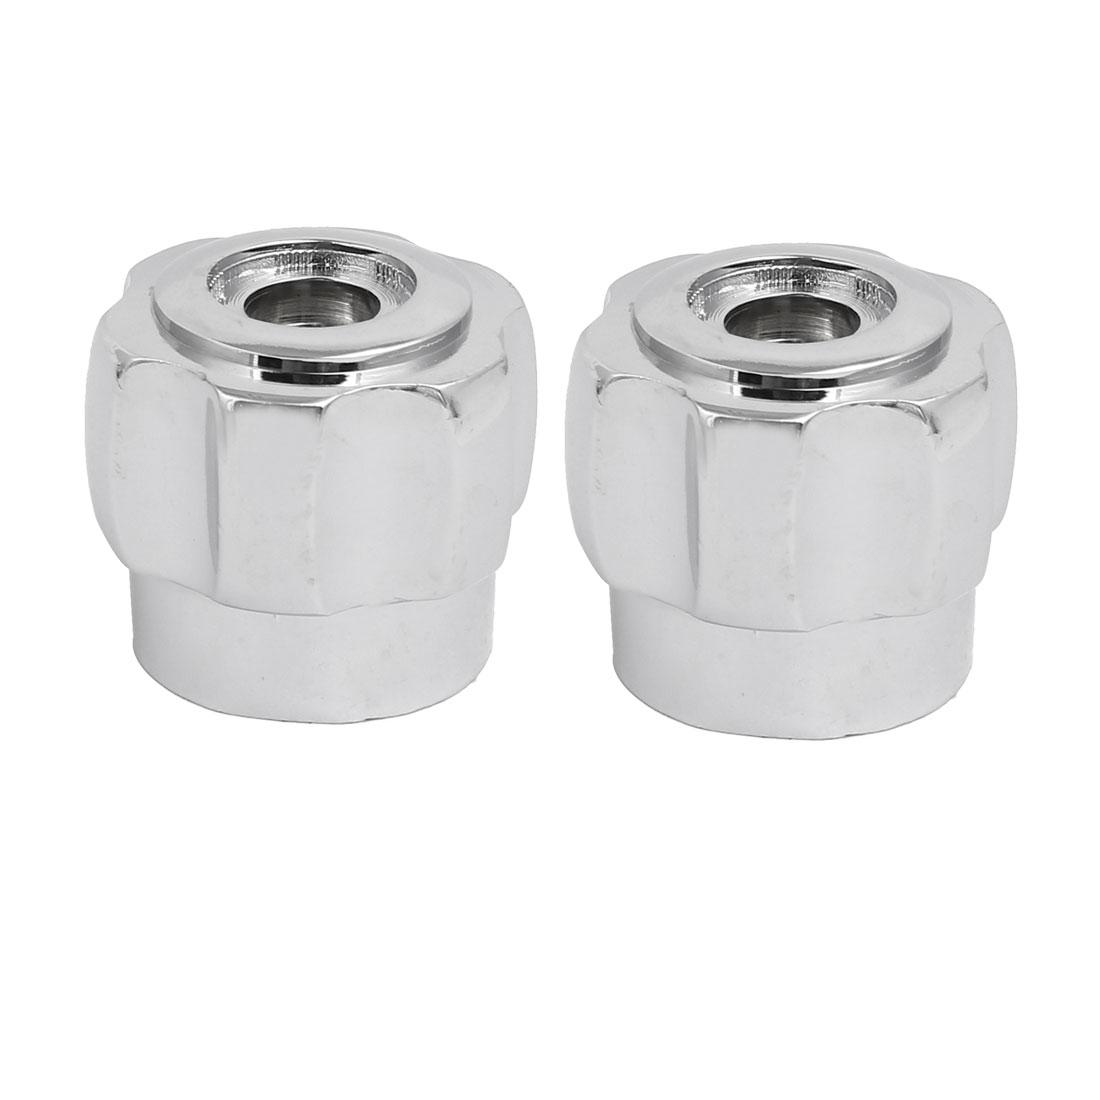 2pcs 35mmx30mm Zinc Alloy Faucet Water Tap Handle Grip Silver Tone